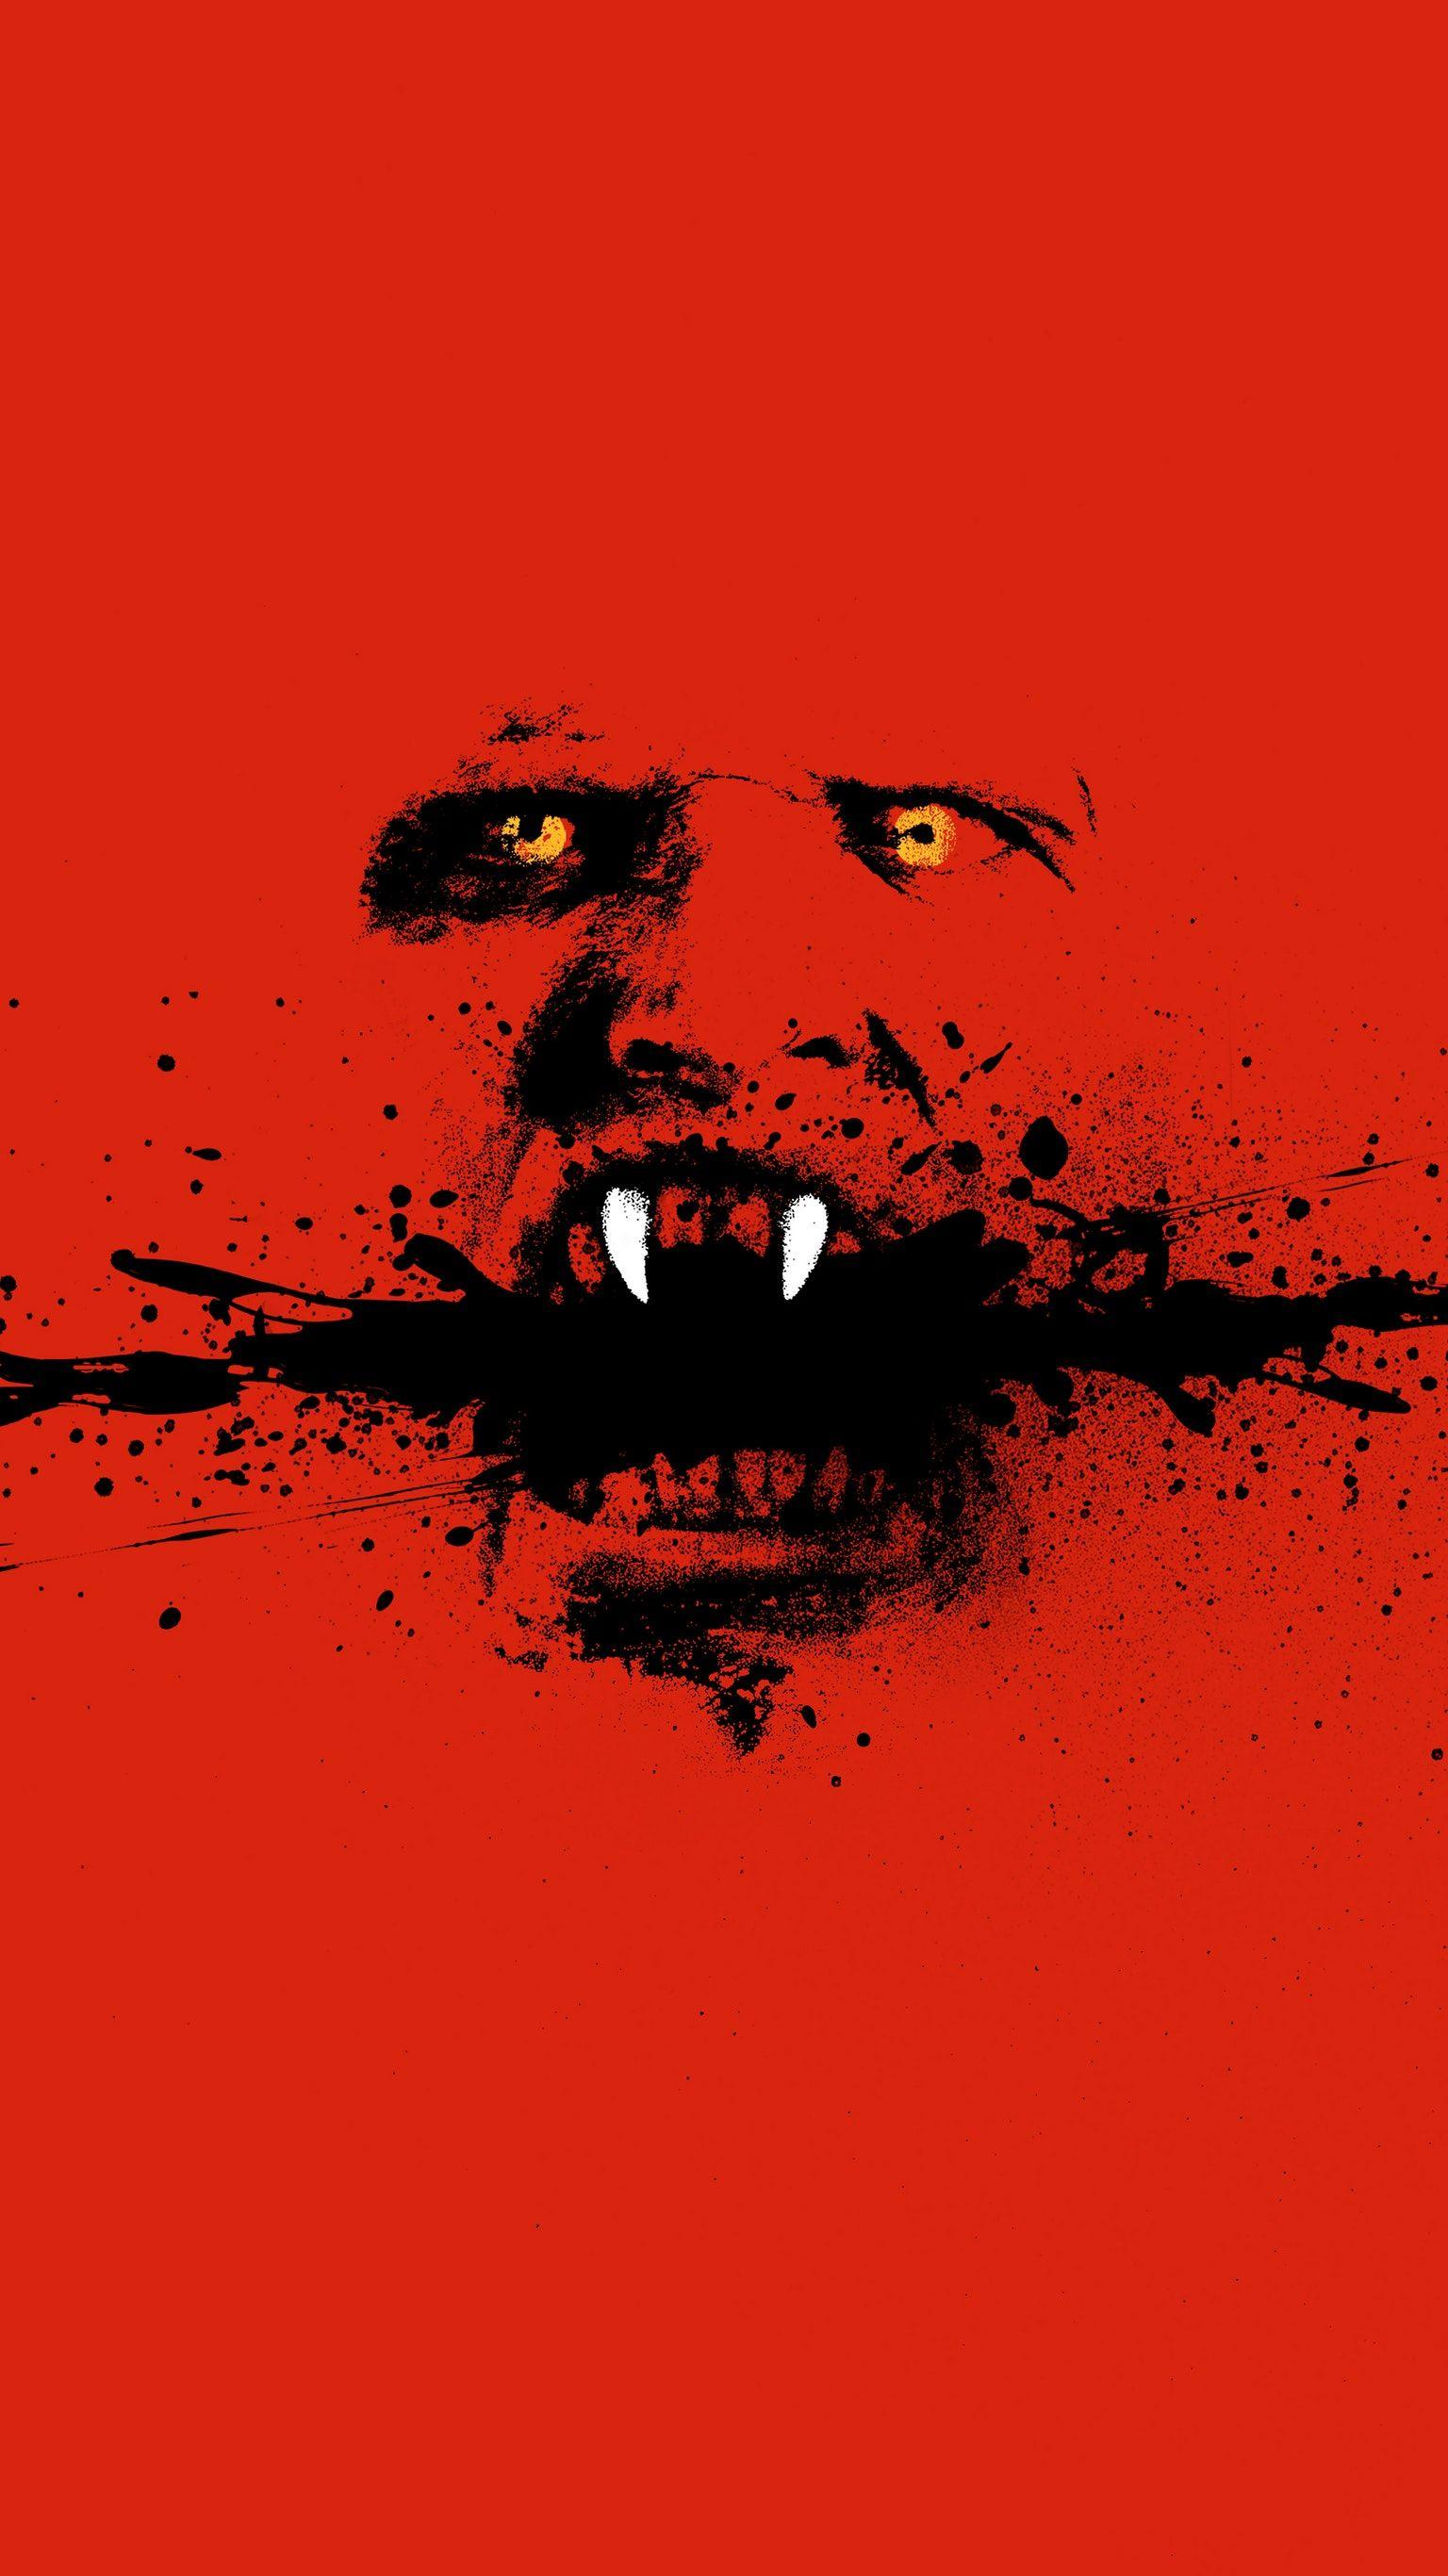 30 Days Of Night 2007 Phone Wallpaper Horror Art 30 Days Of